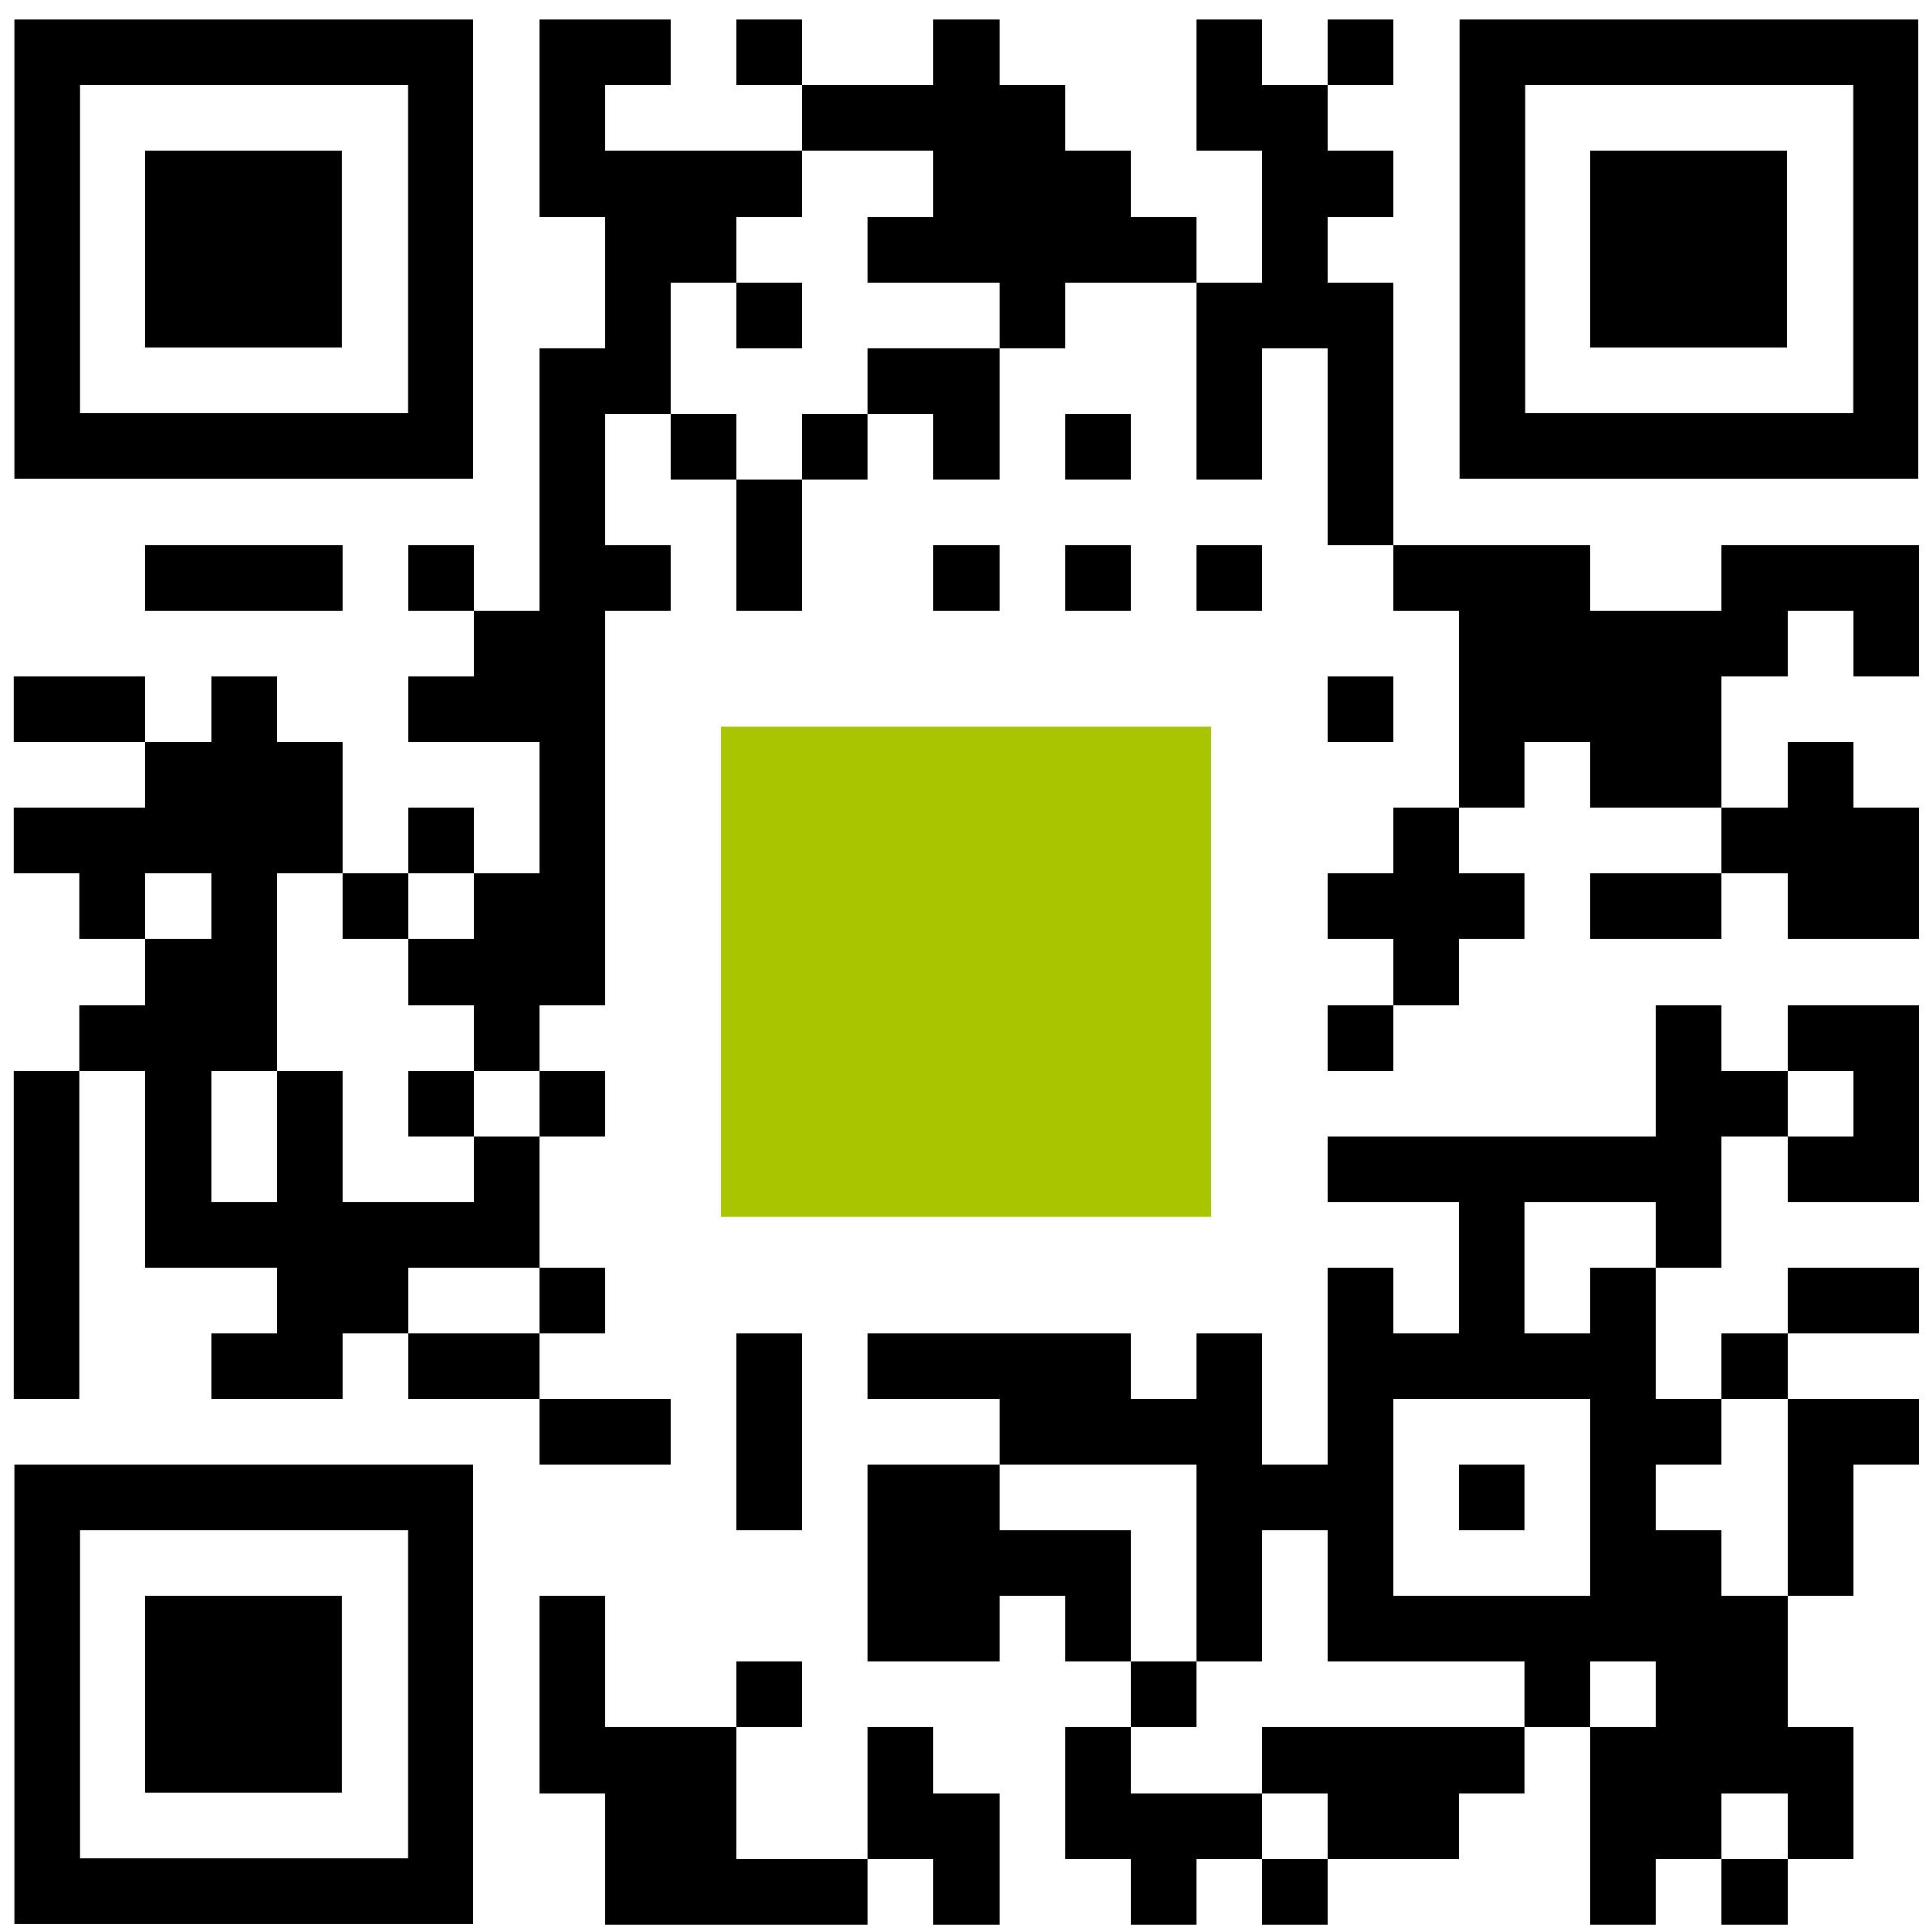 QR_Code_ASPION_G-Log_App